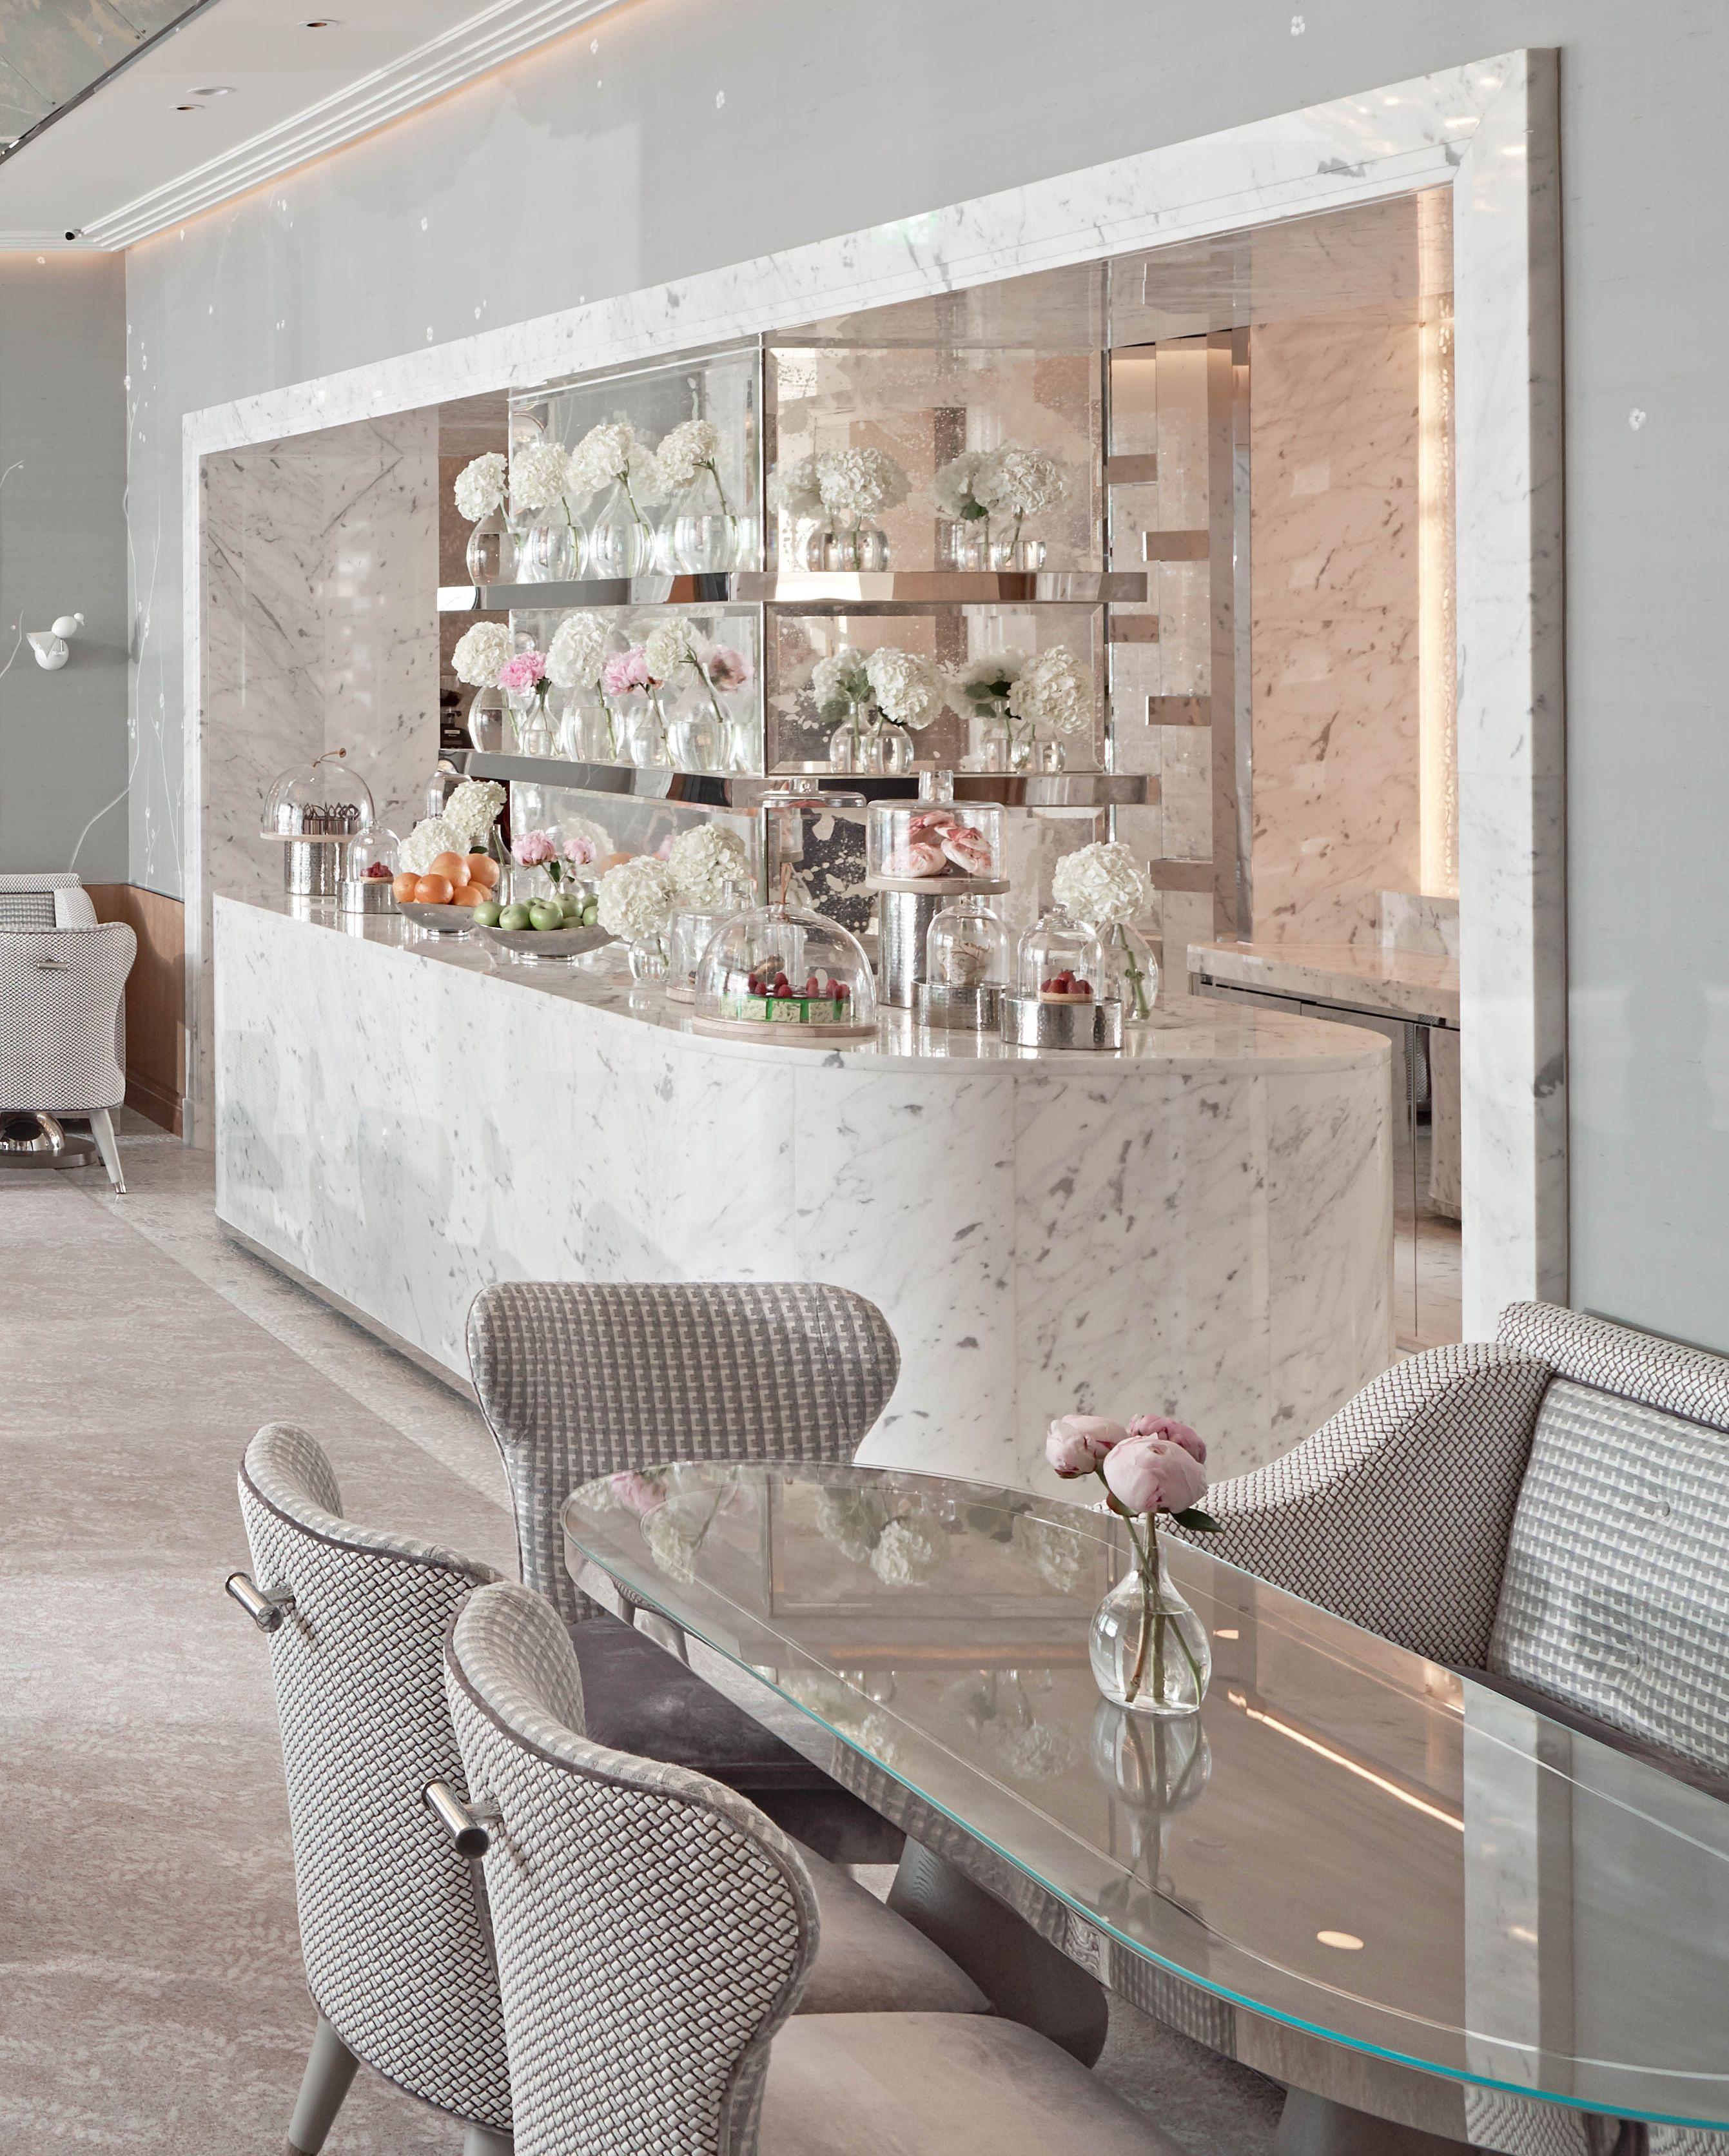 Robert Angell Design International Collins Room